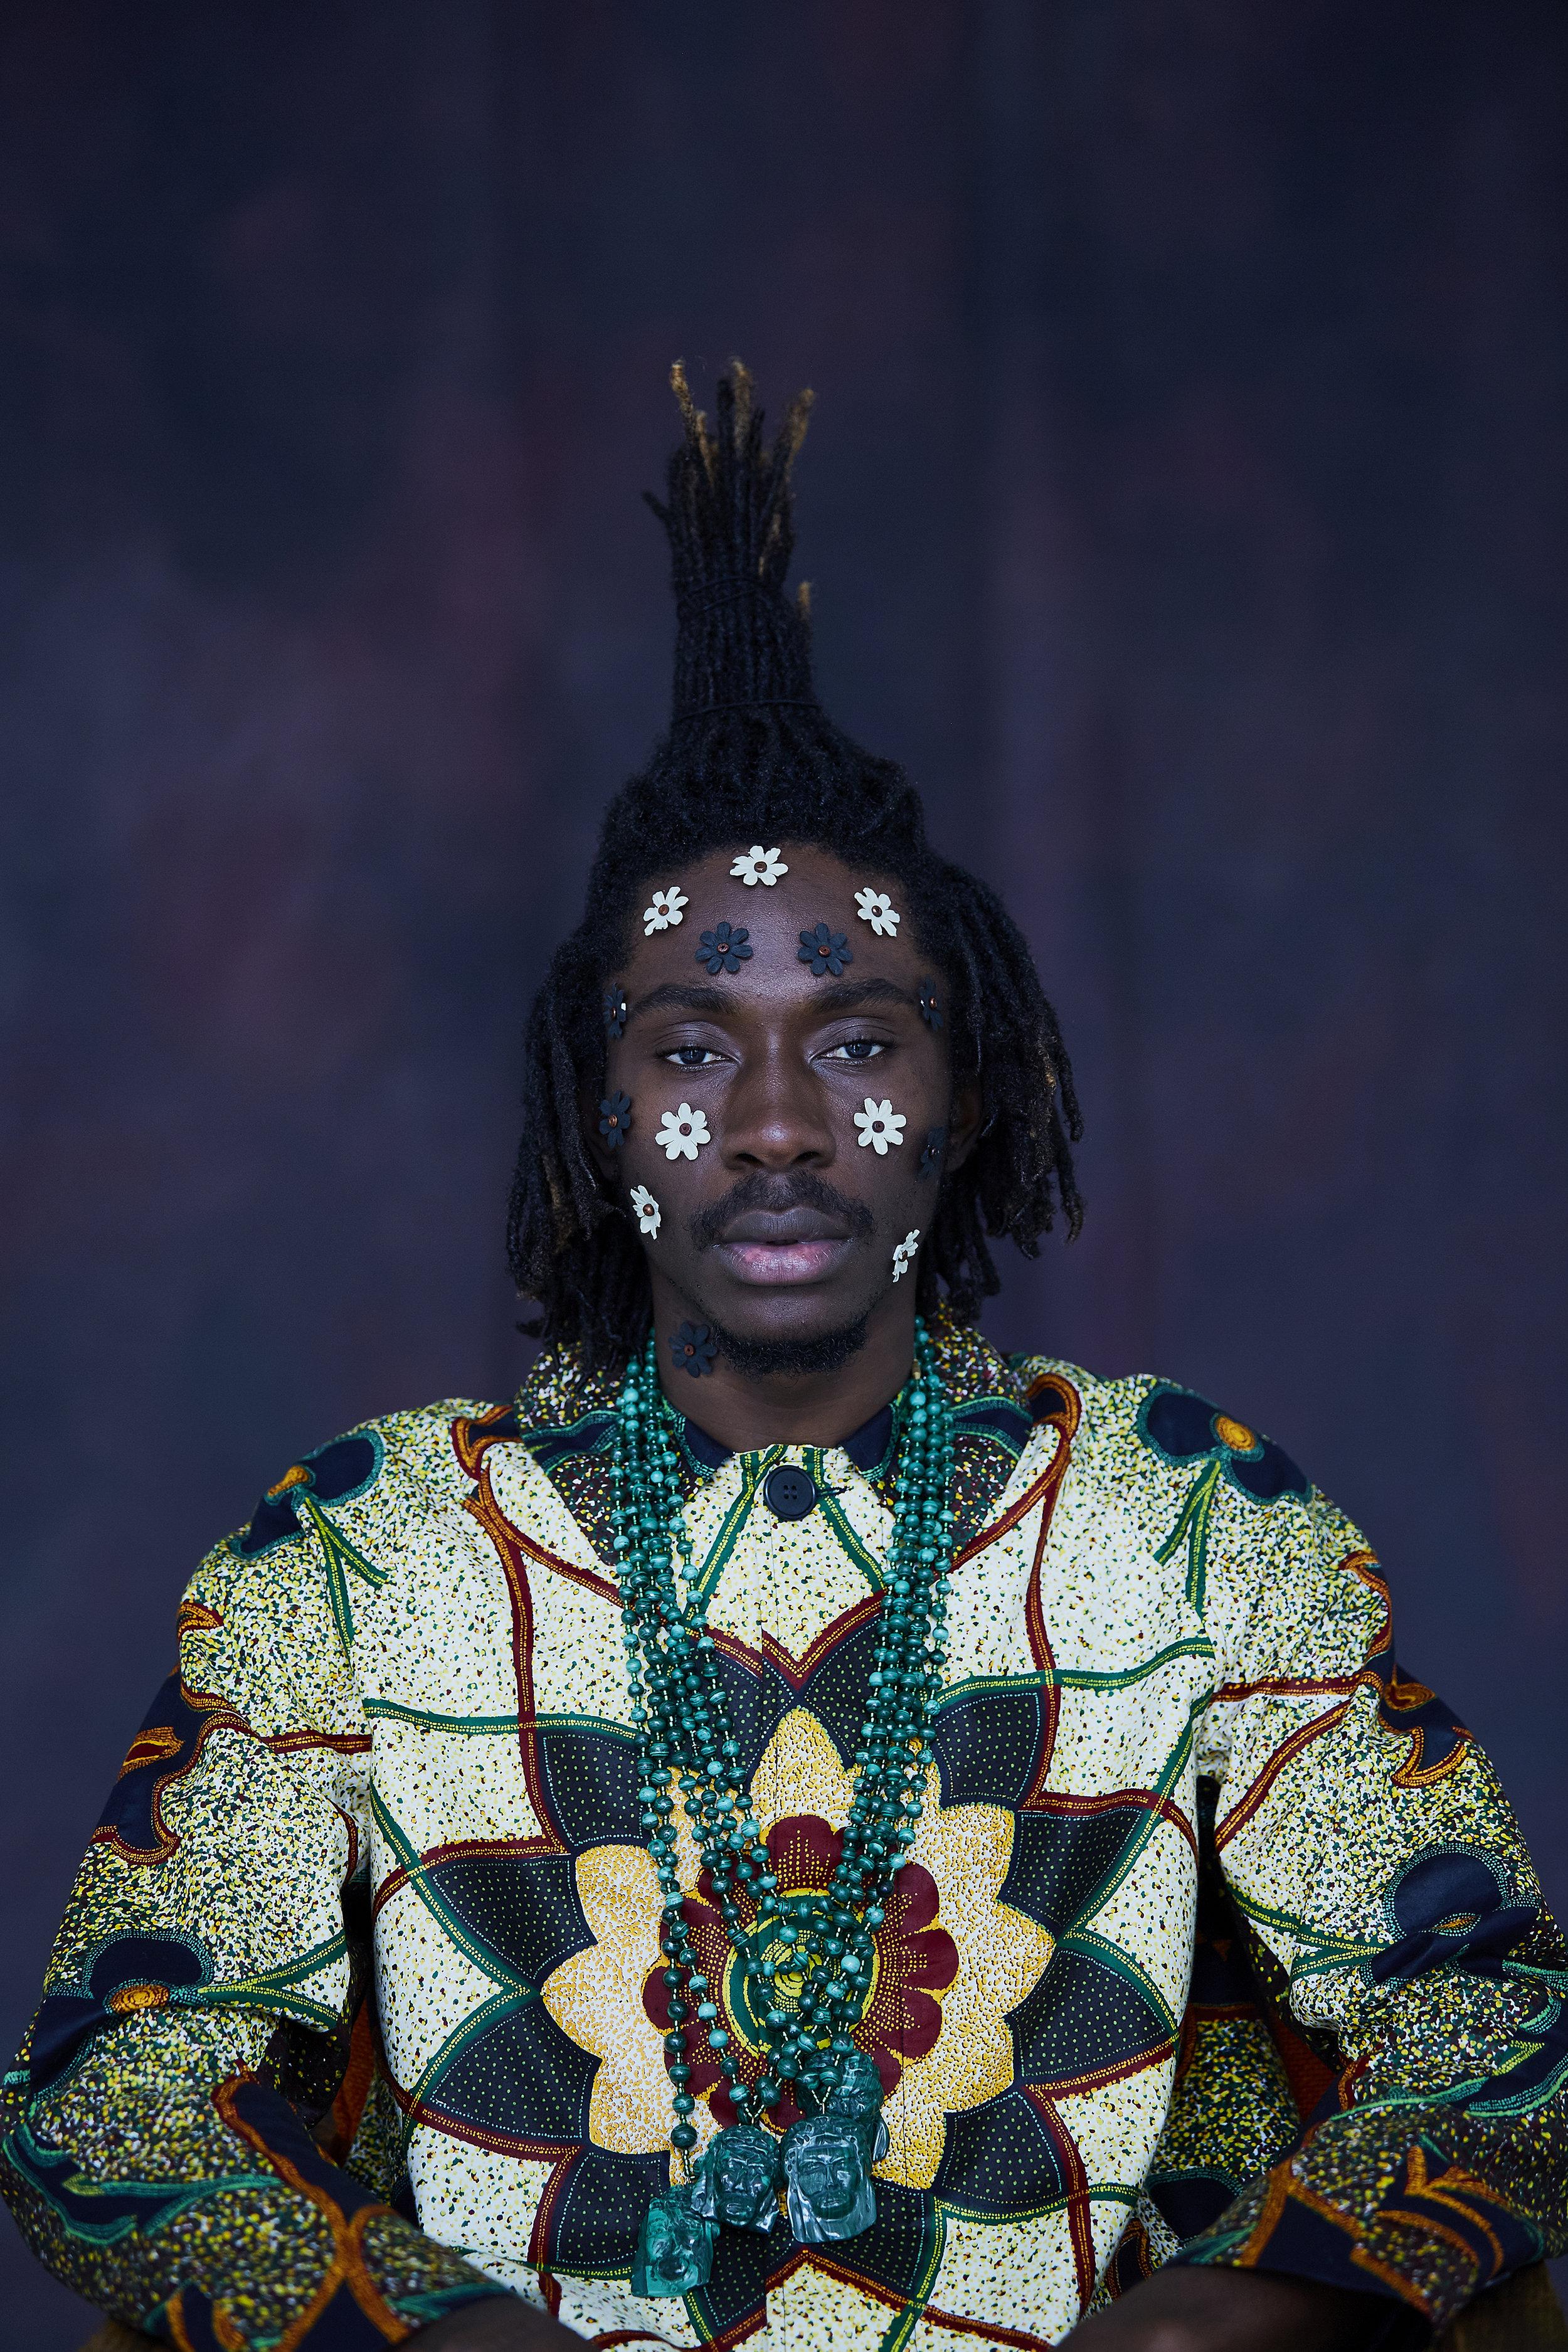 Hugo_AfricaPrint_Shot_9-0023.jpg